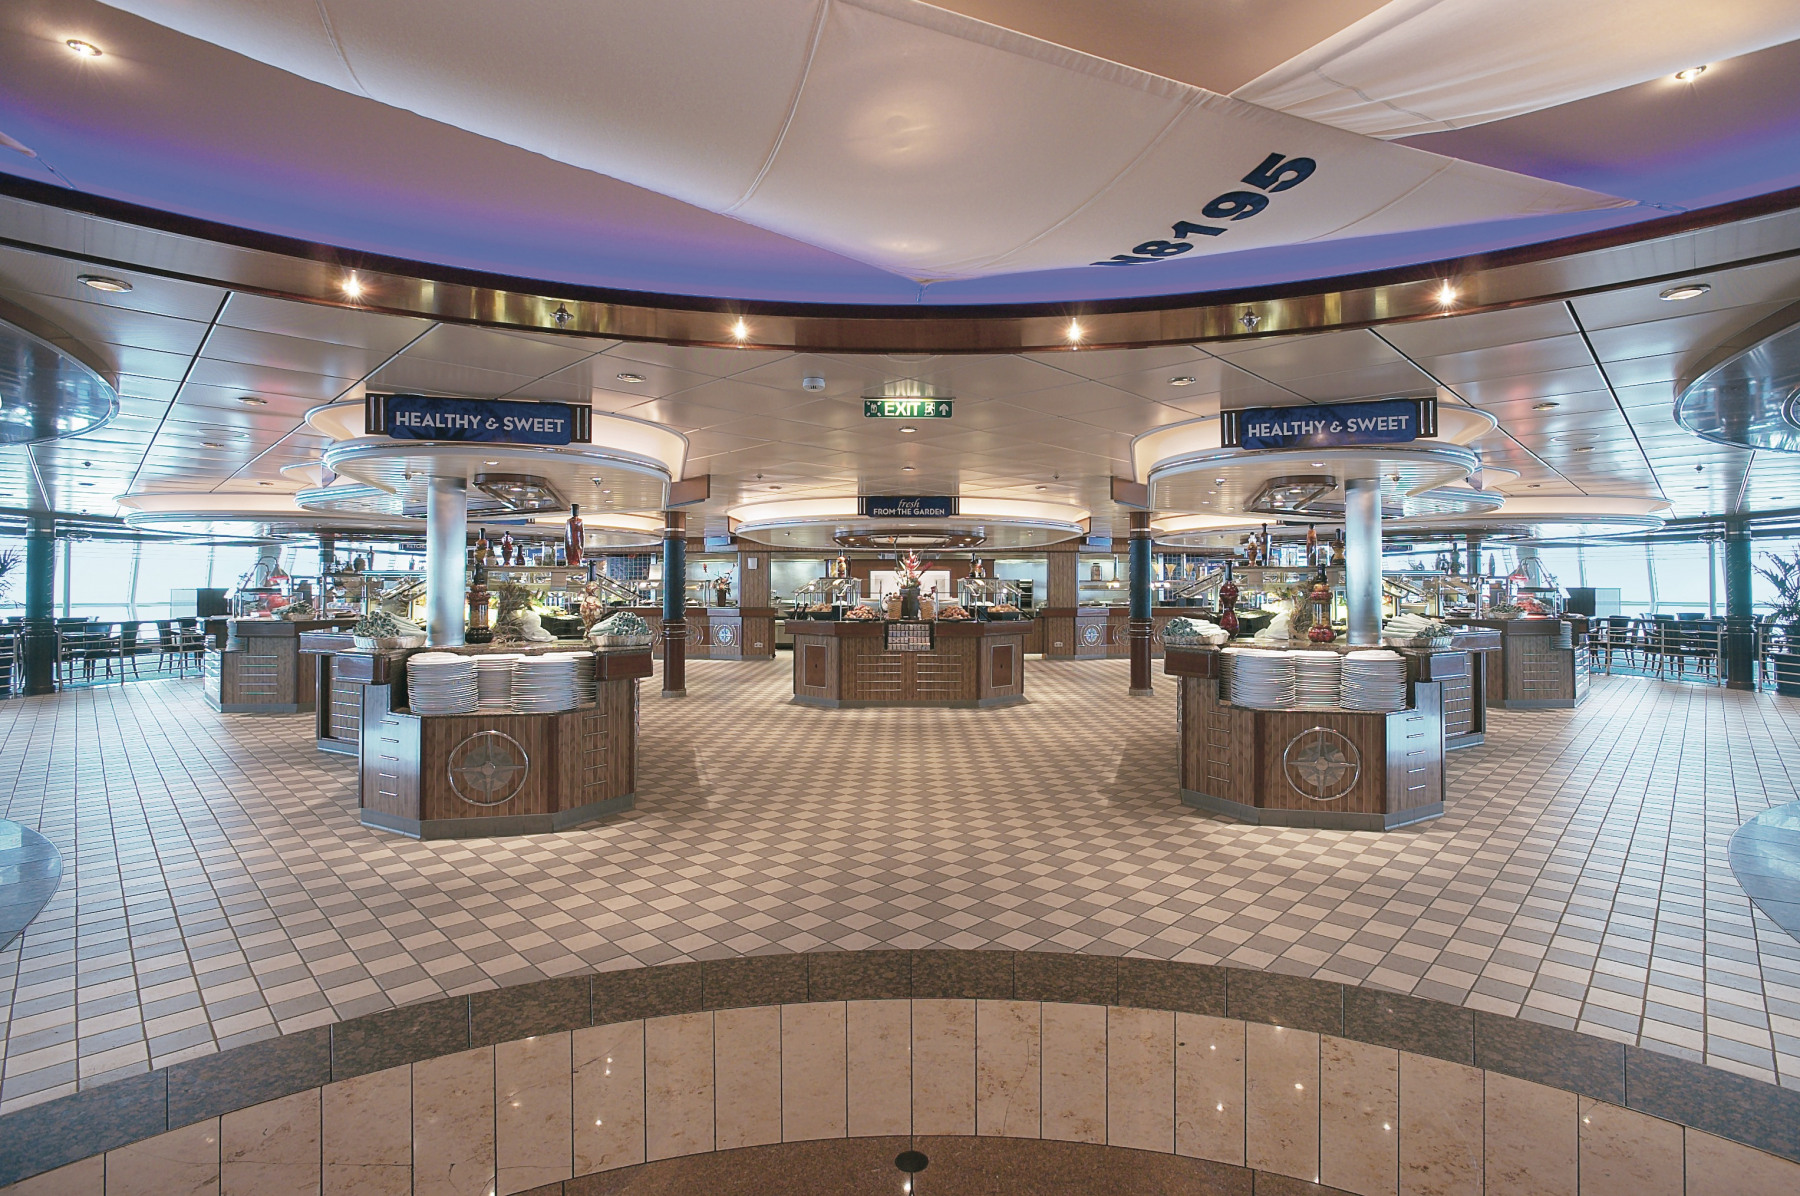 Royal Caribbean International Jewel of the Seas Interior Windjammer 3.jpeg